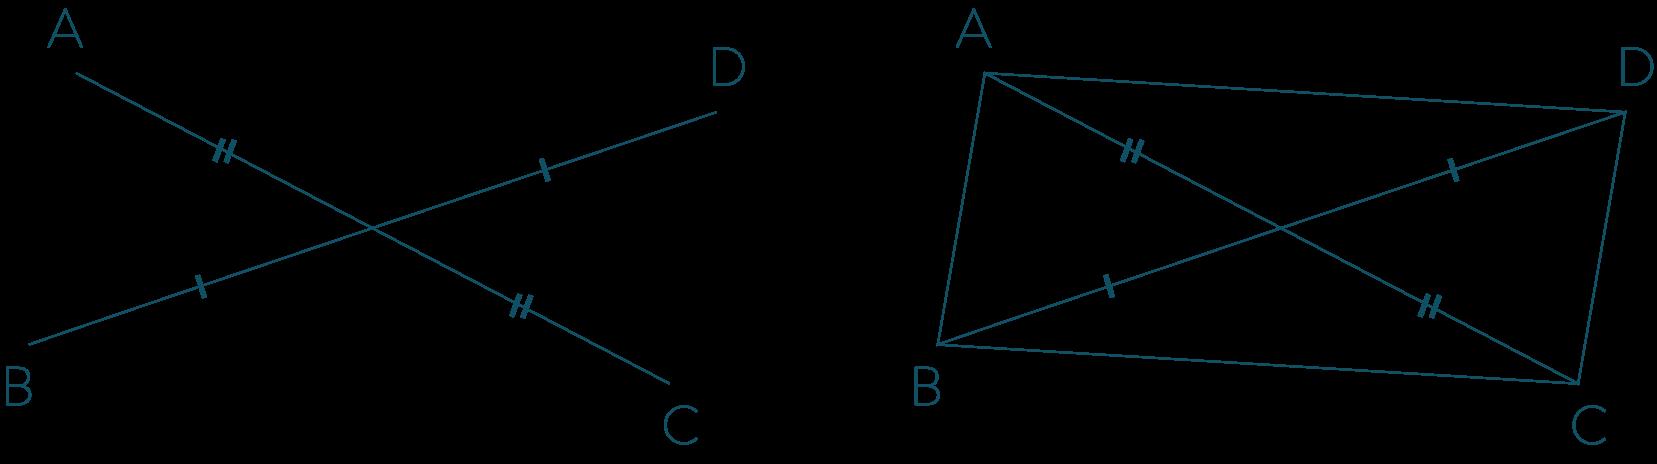 Parallélogramme-Mathématiques-4e